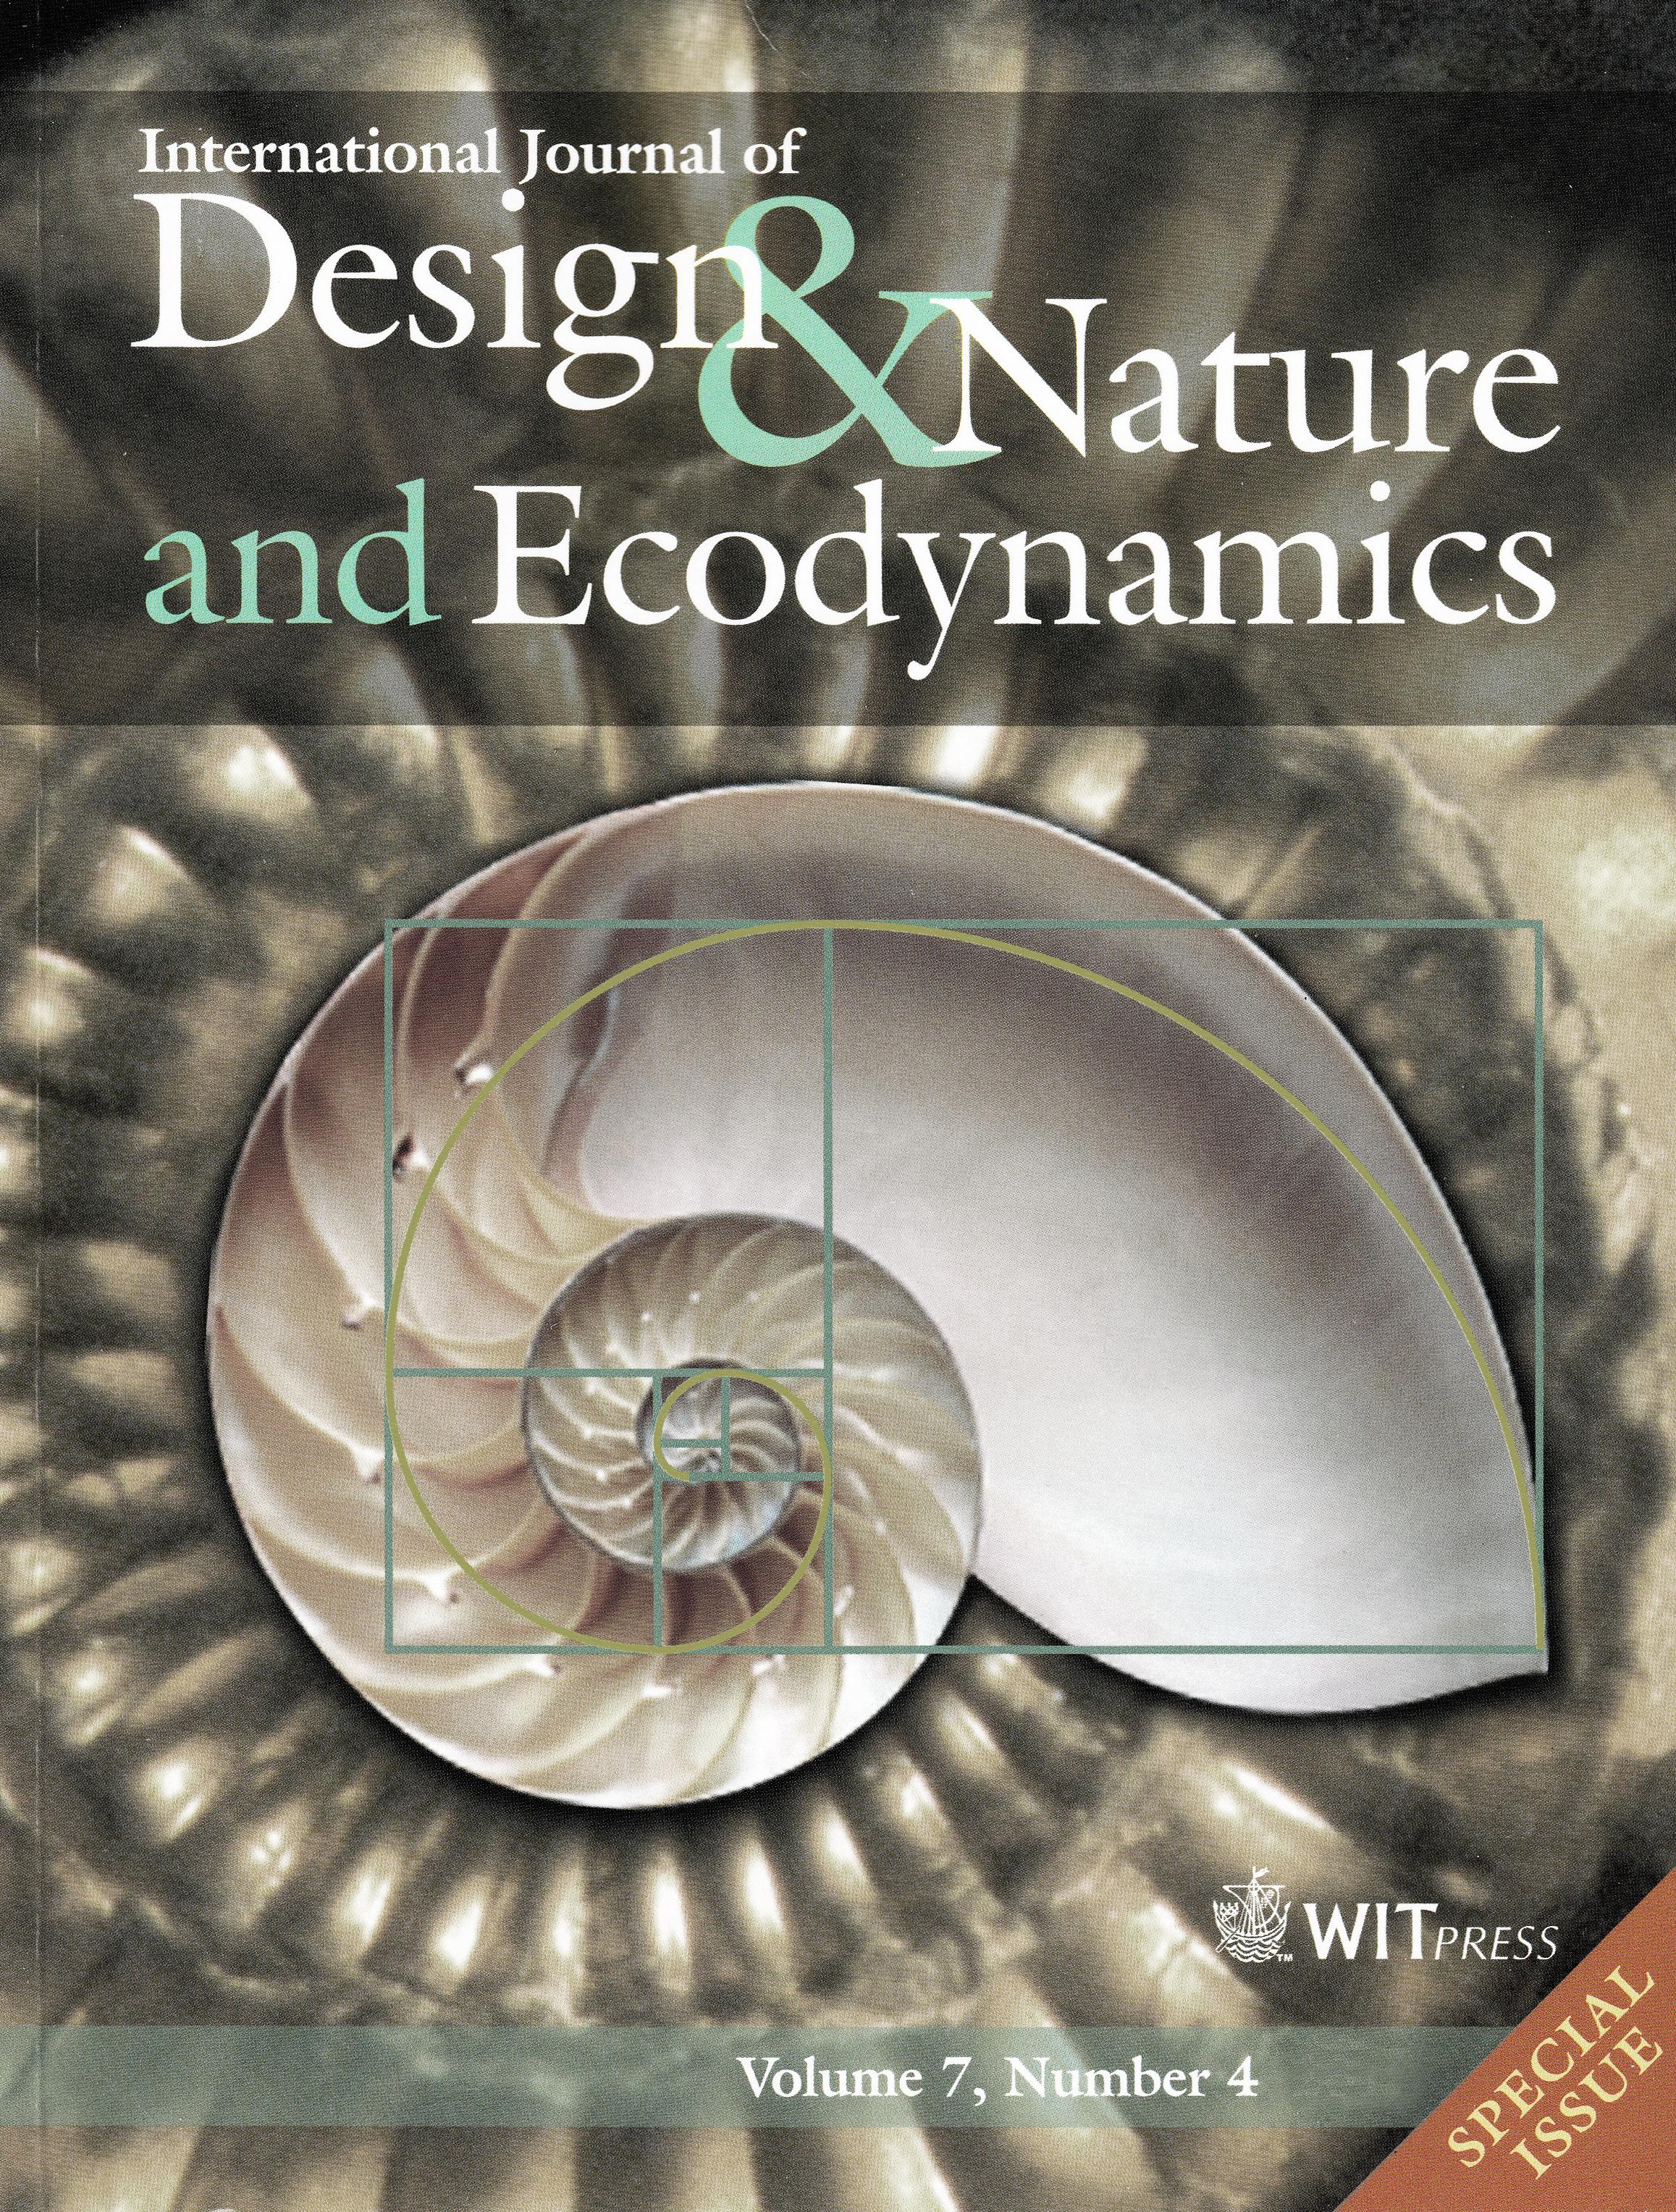 2013_0805 Matt Fajkus MF Architecture Design Nature Ecodynamics Cover.jpg